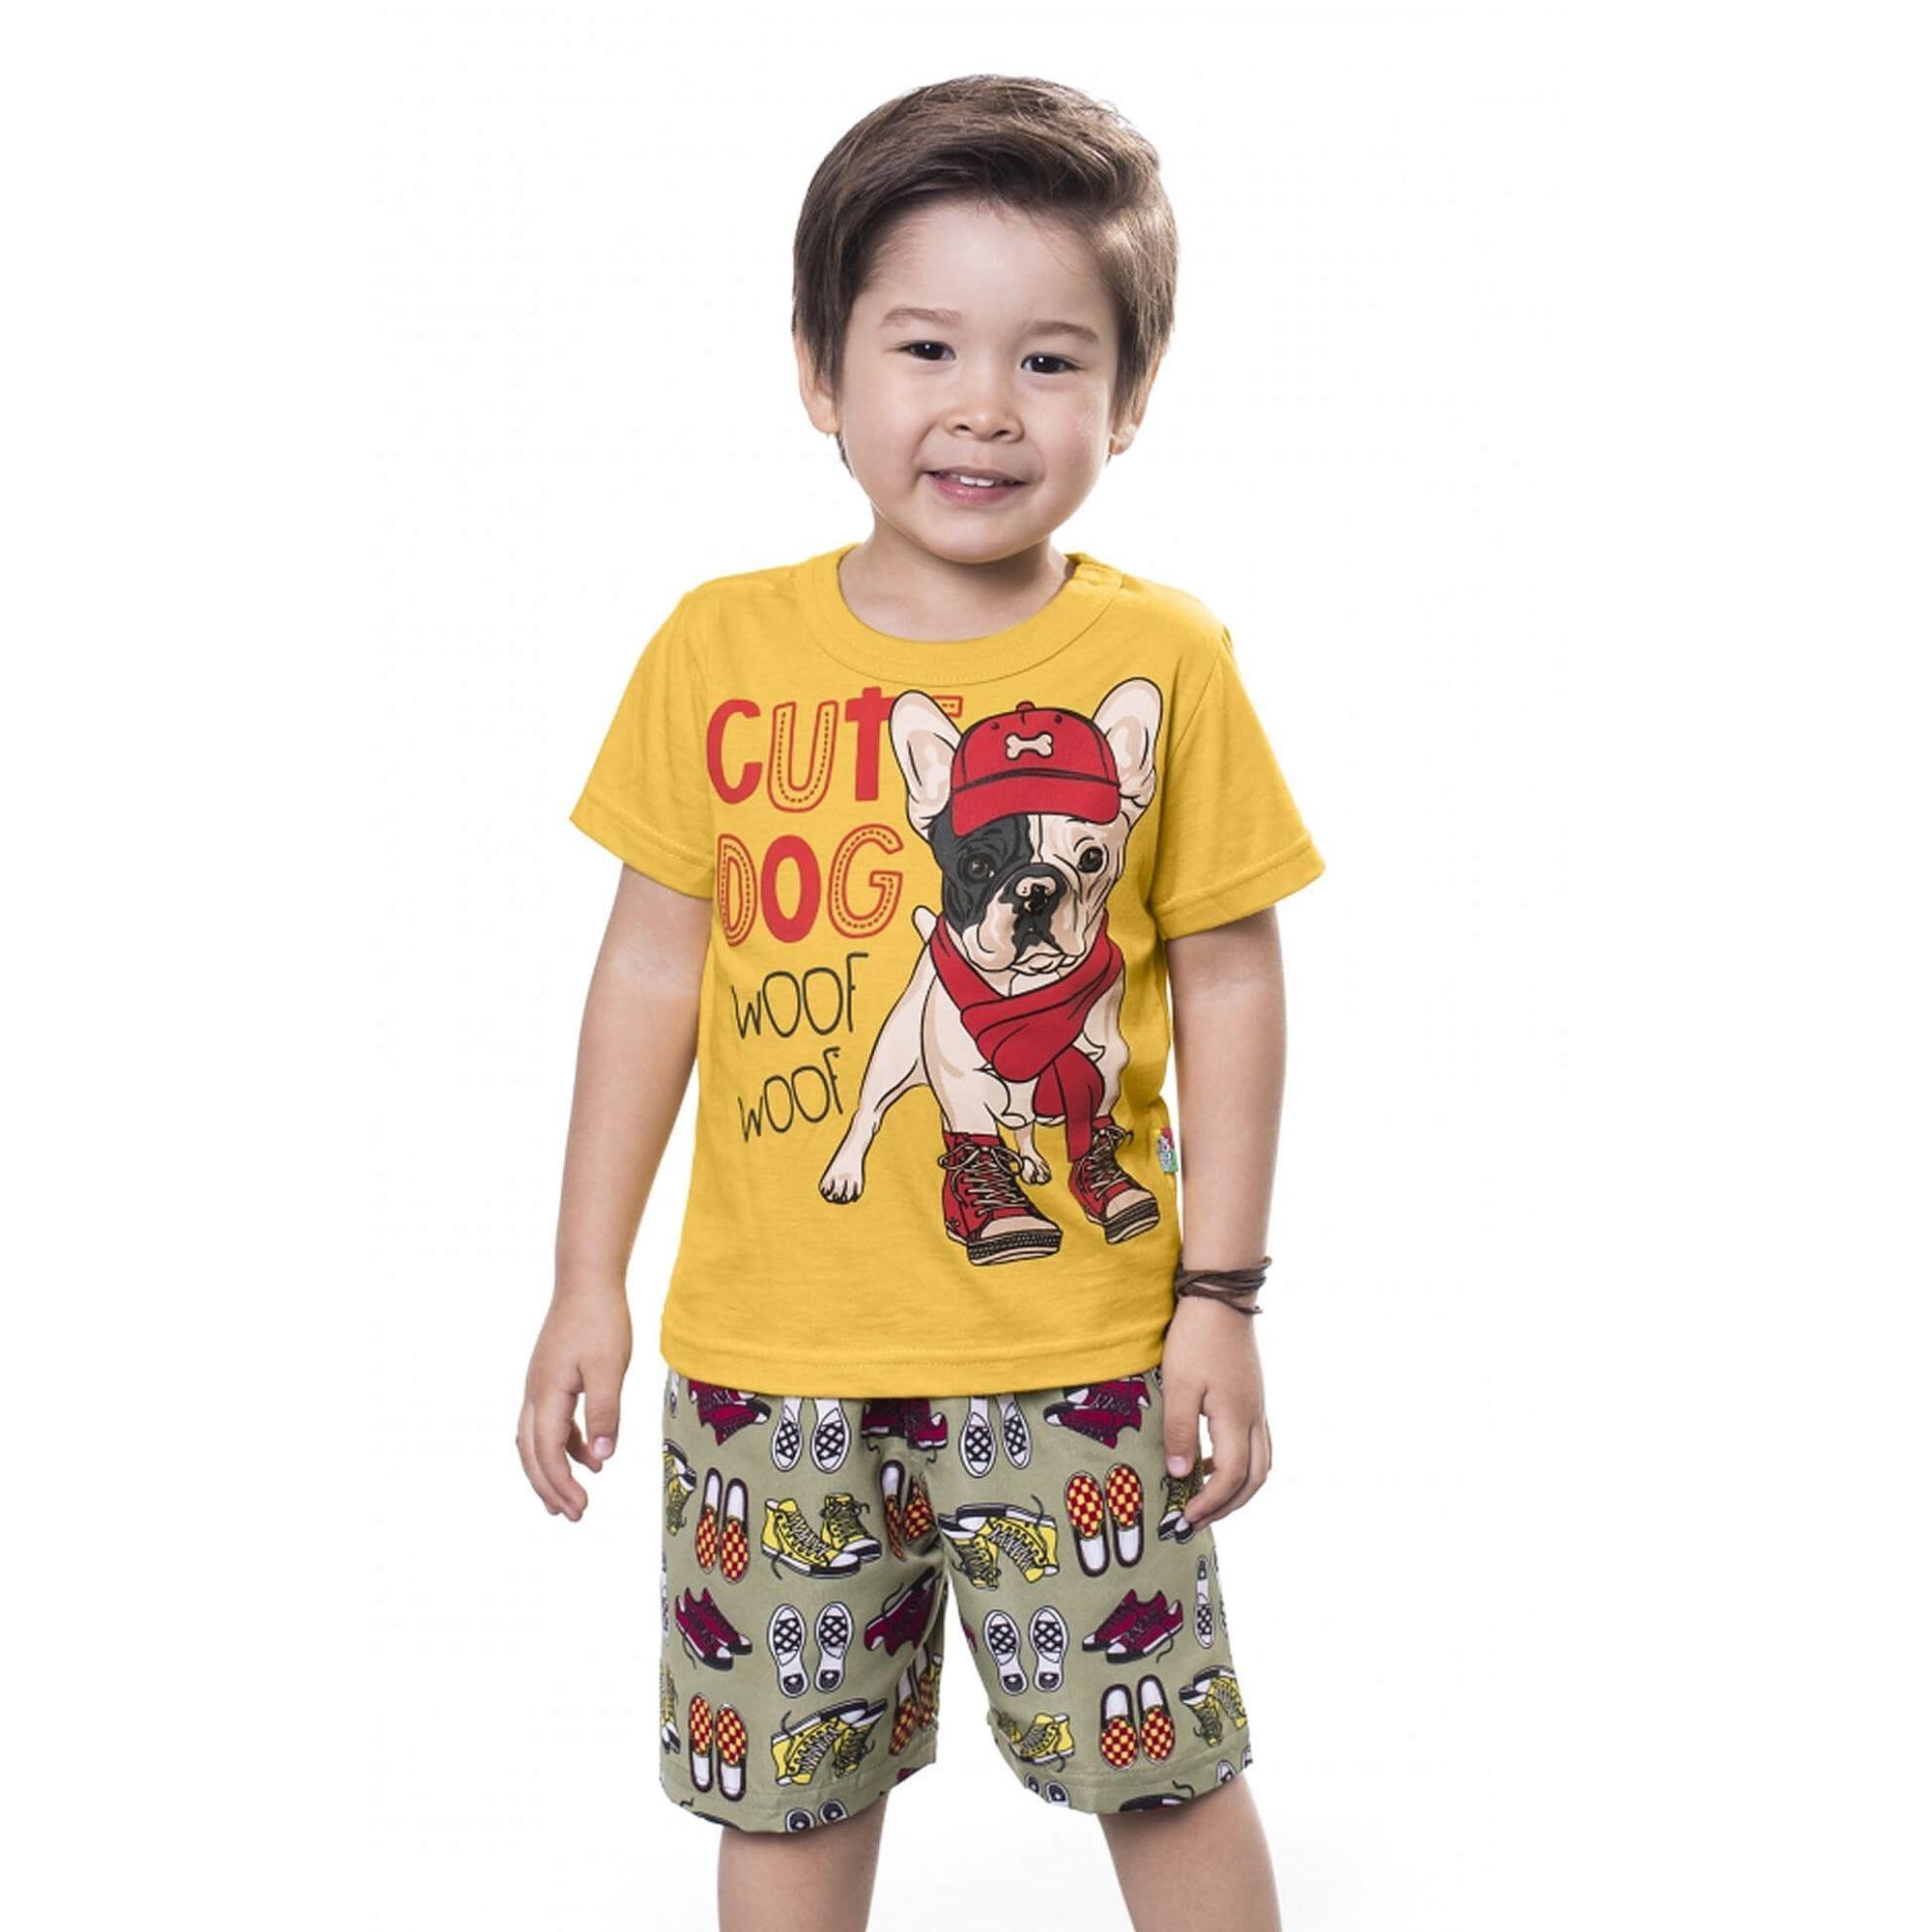 conjunto-menino-camiseta-amarela-bulldog-e-bermuda-microfibra-bee-loop